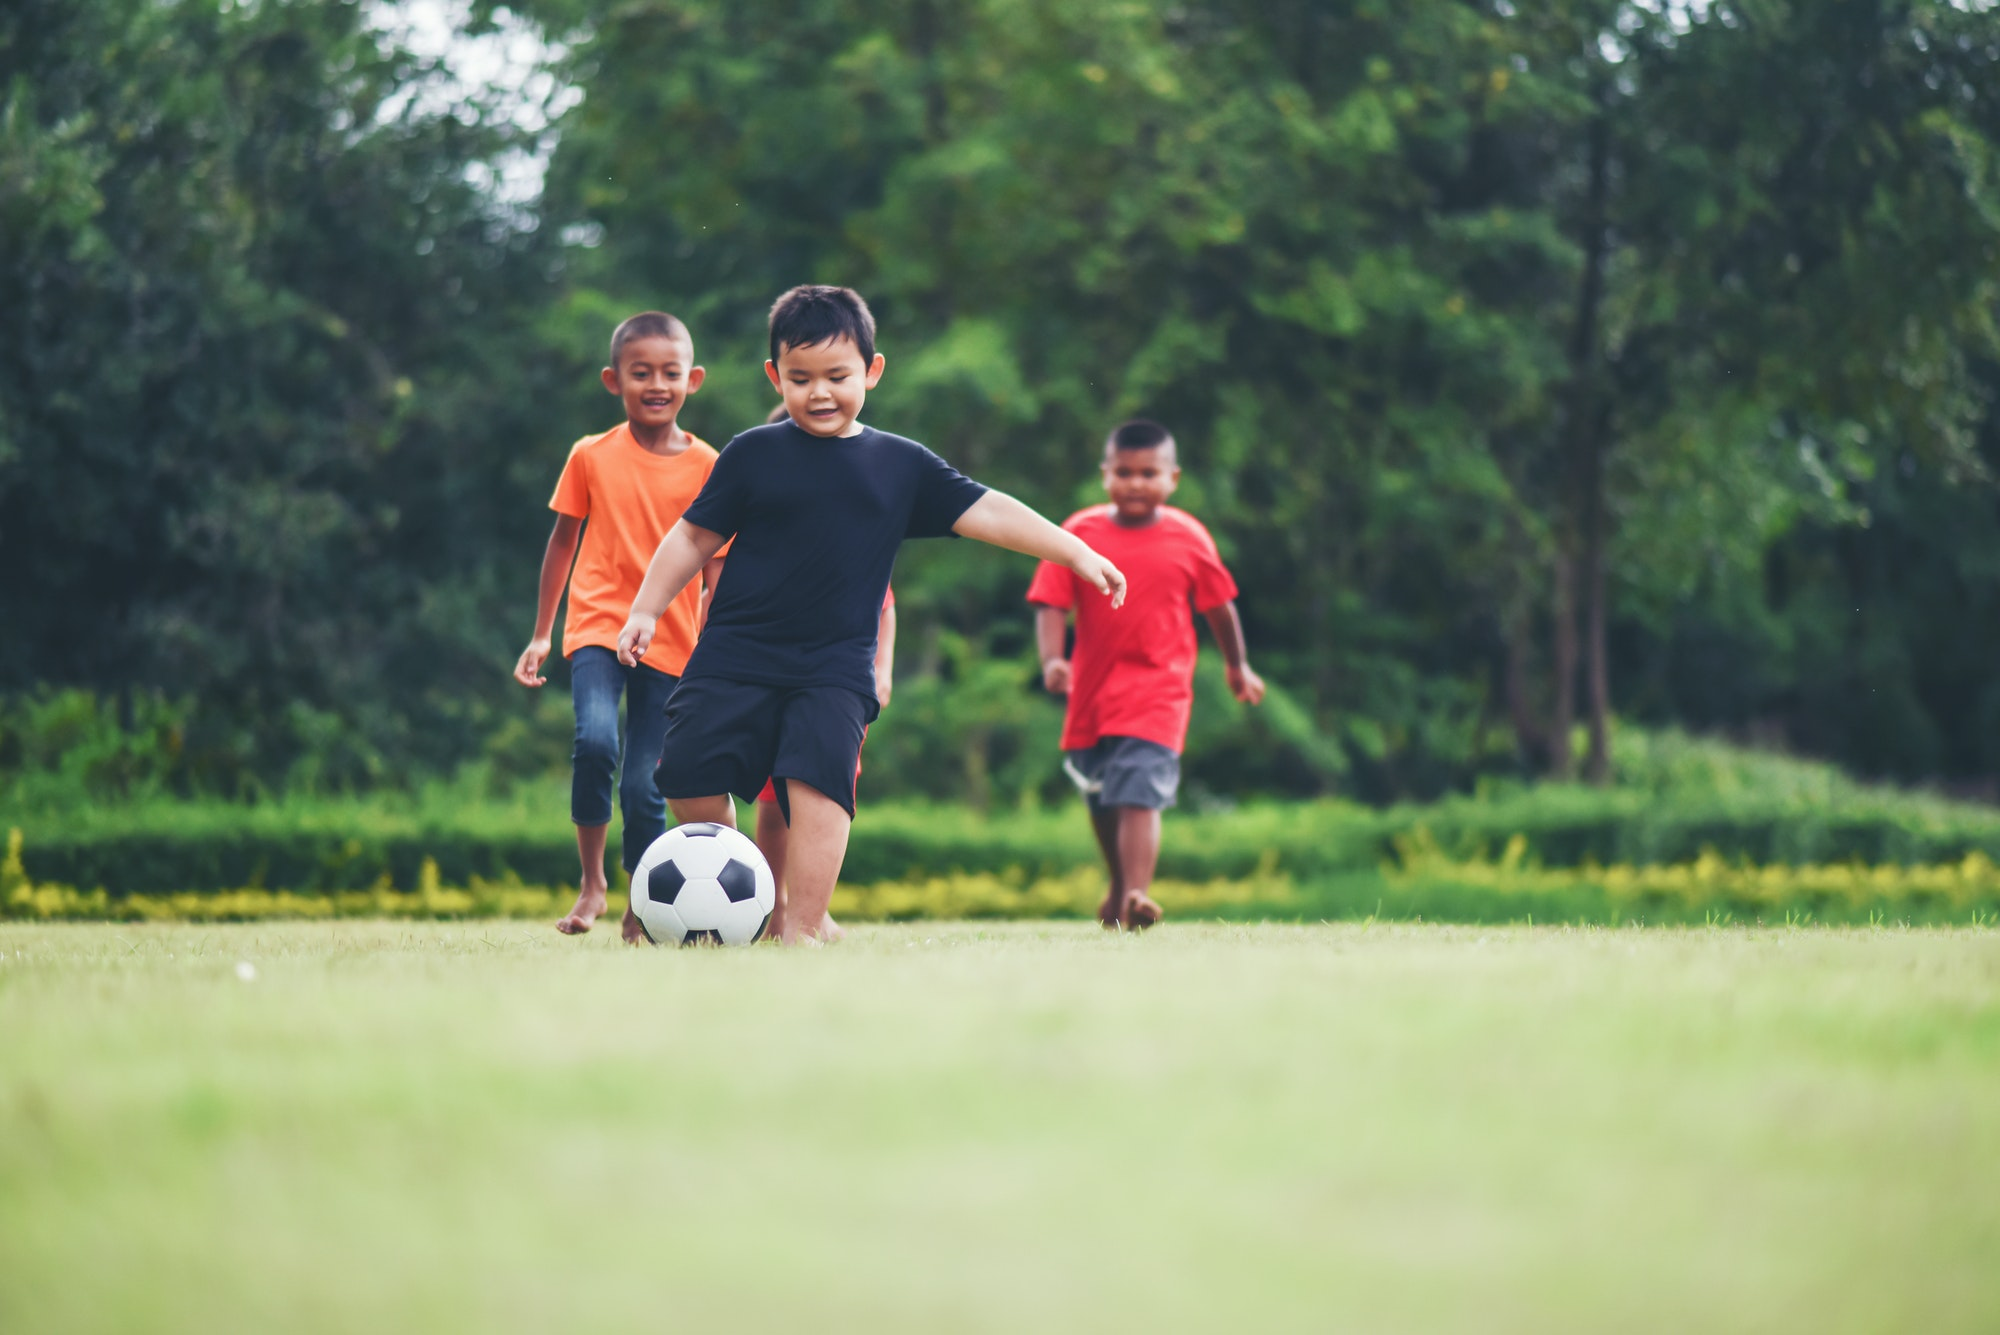 Kids playing soccer football